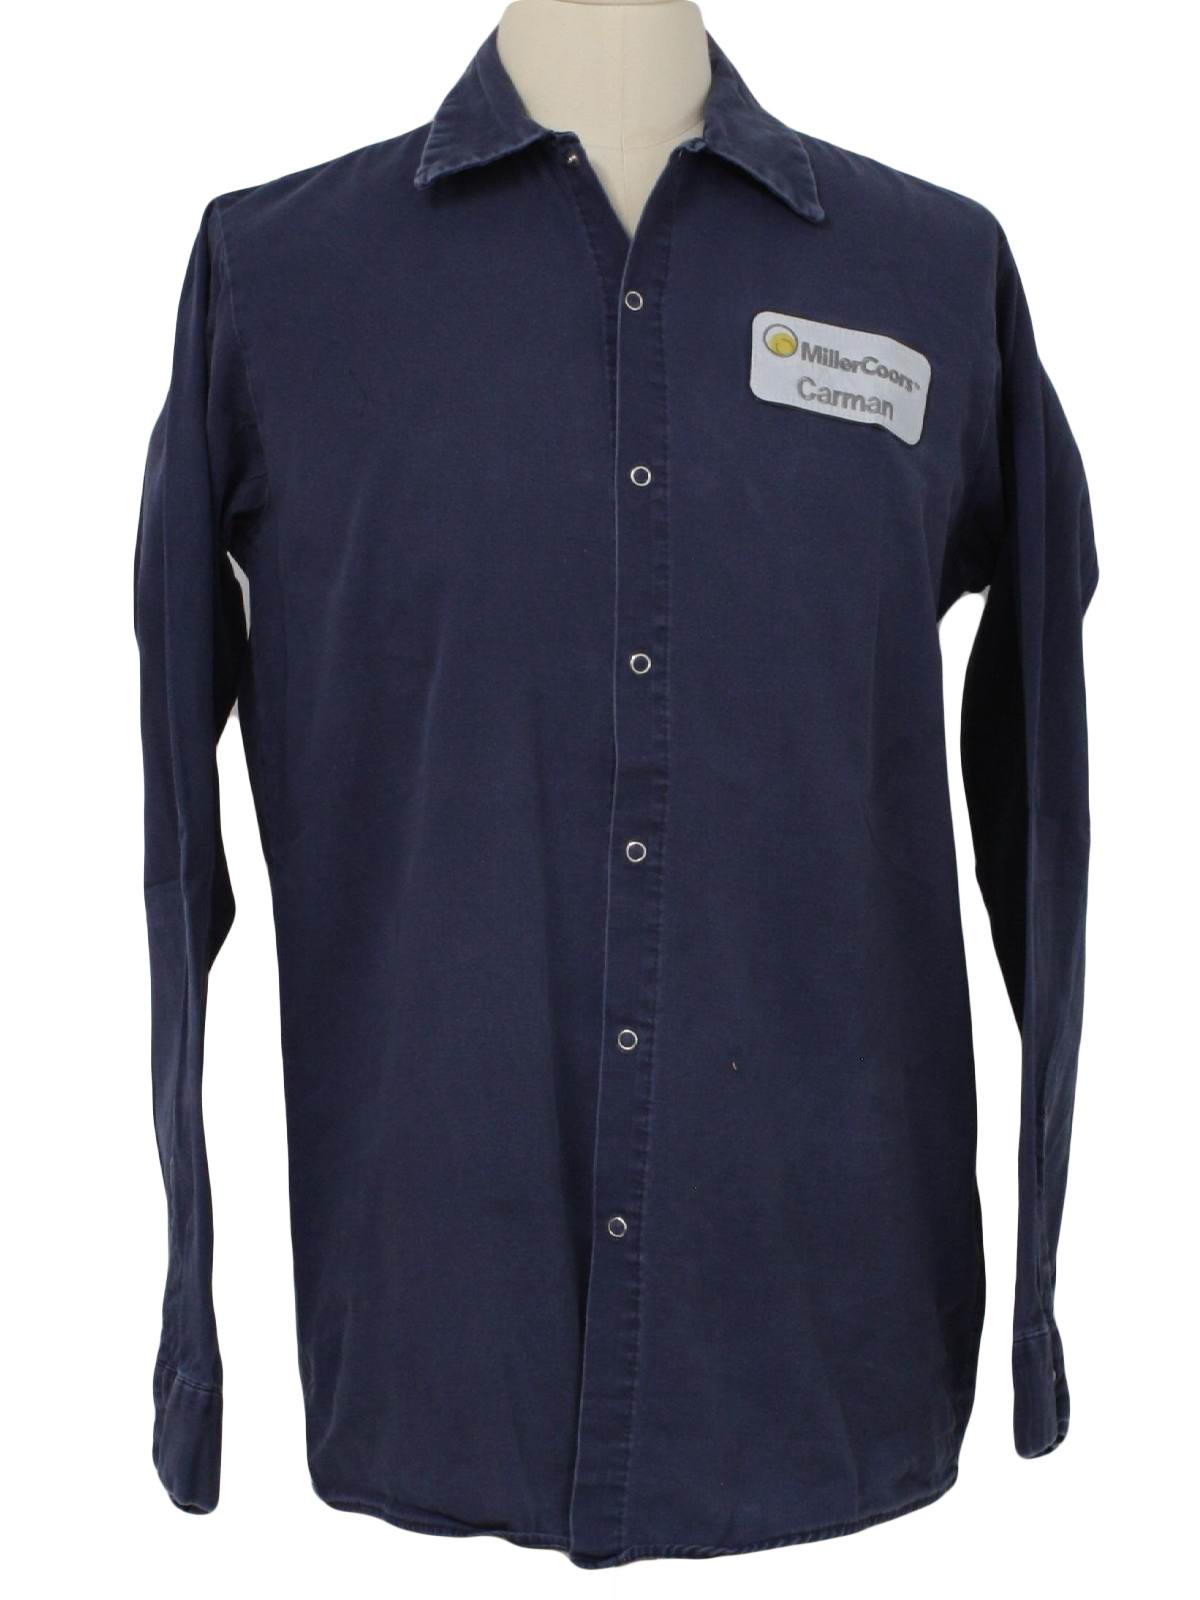 5f606314 Vintage Red Kap 1990s Shirt: 90s -Red Kap- Mens faded navy blue ...